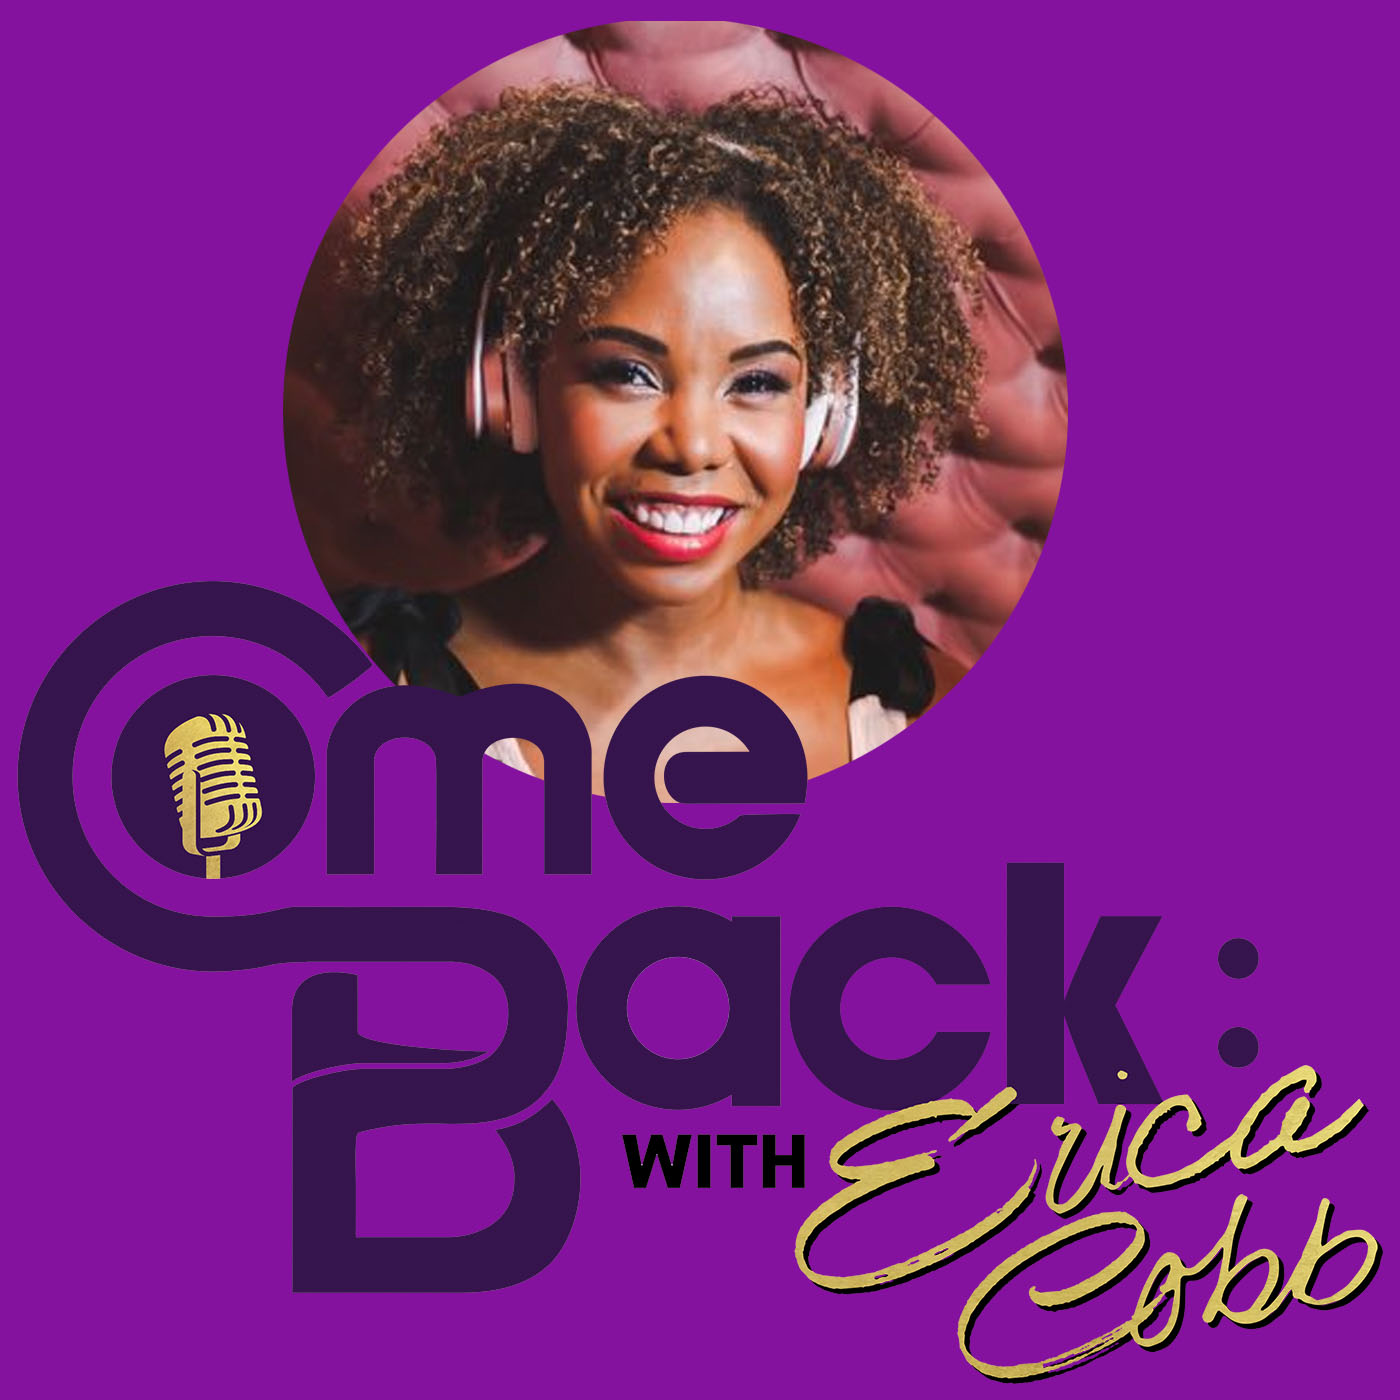 Artwork for (Trailer 2) Comeback: with Erica Cobb